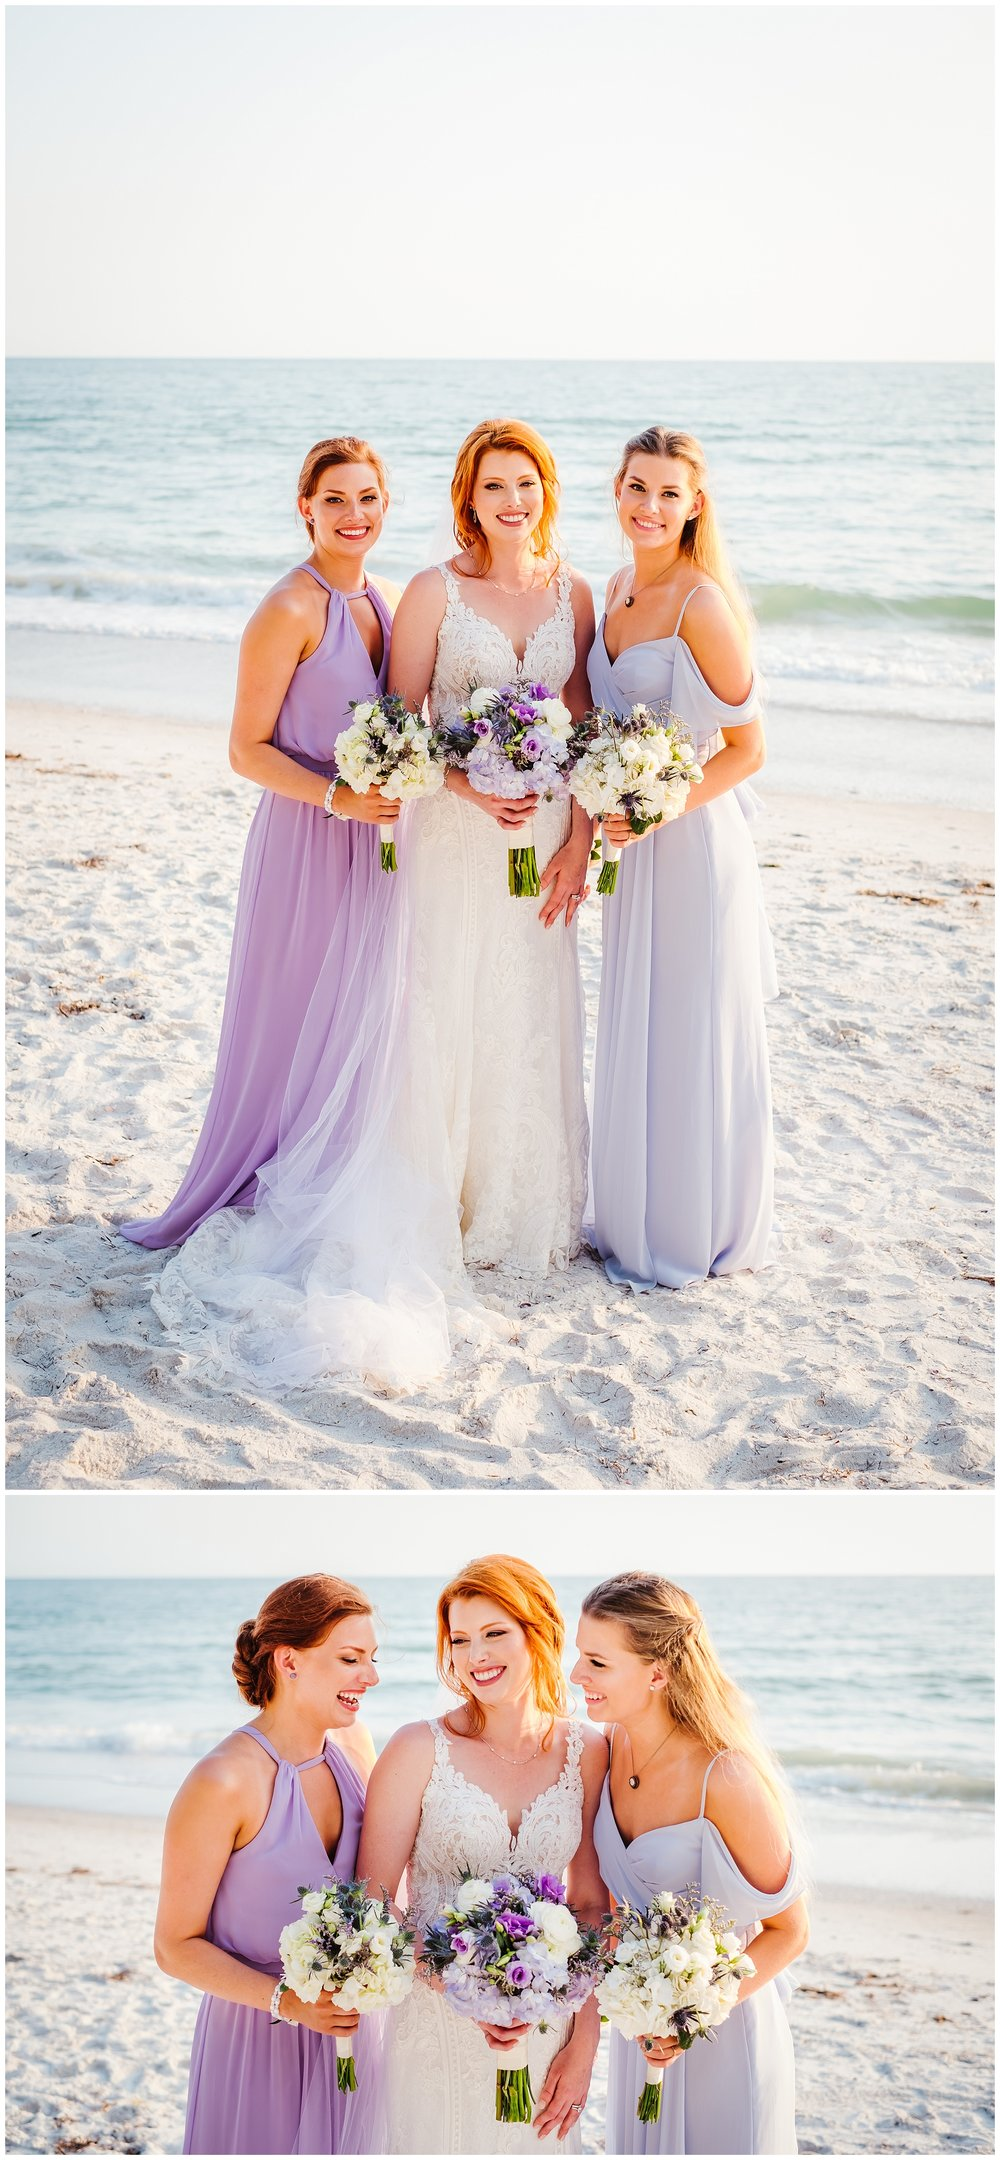 tampa-st-pete-wedding-photographer-indian-rocks-beach-mermaid-train-redhead_0147.jpg